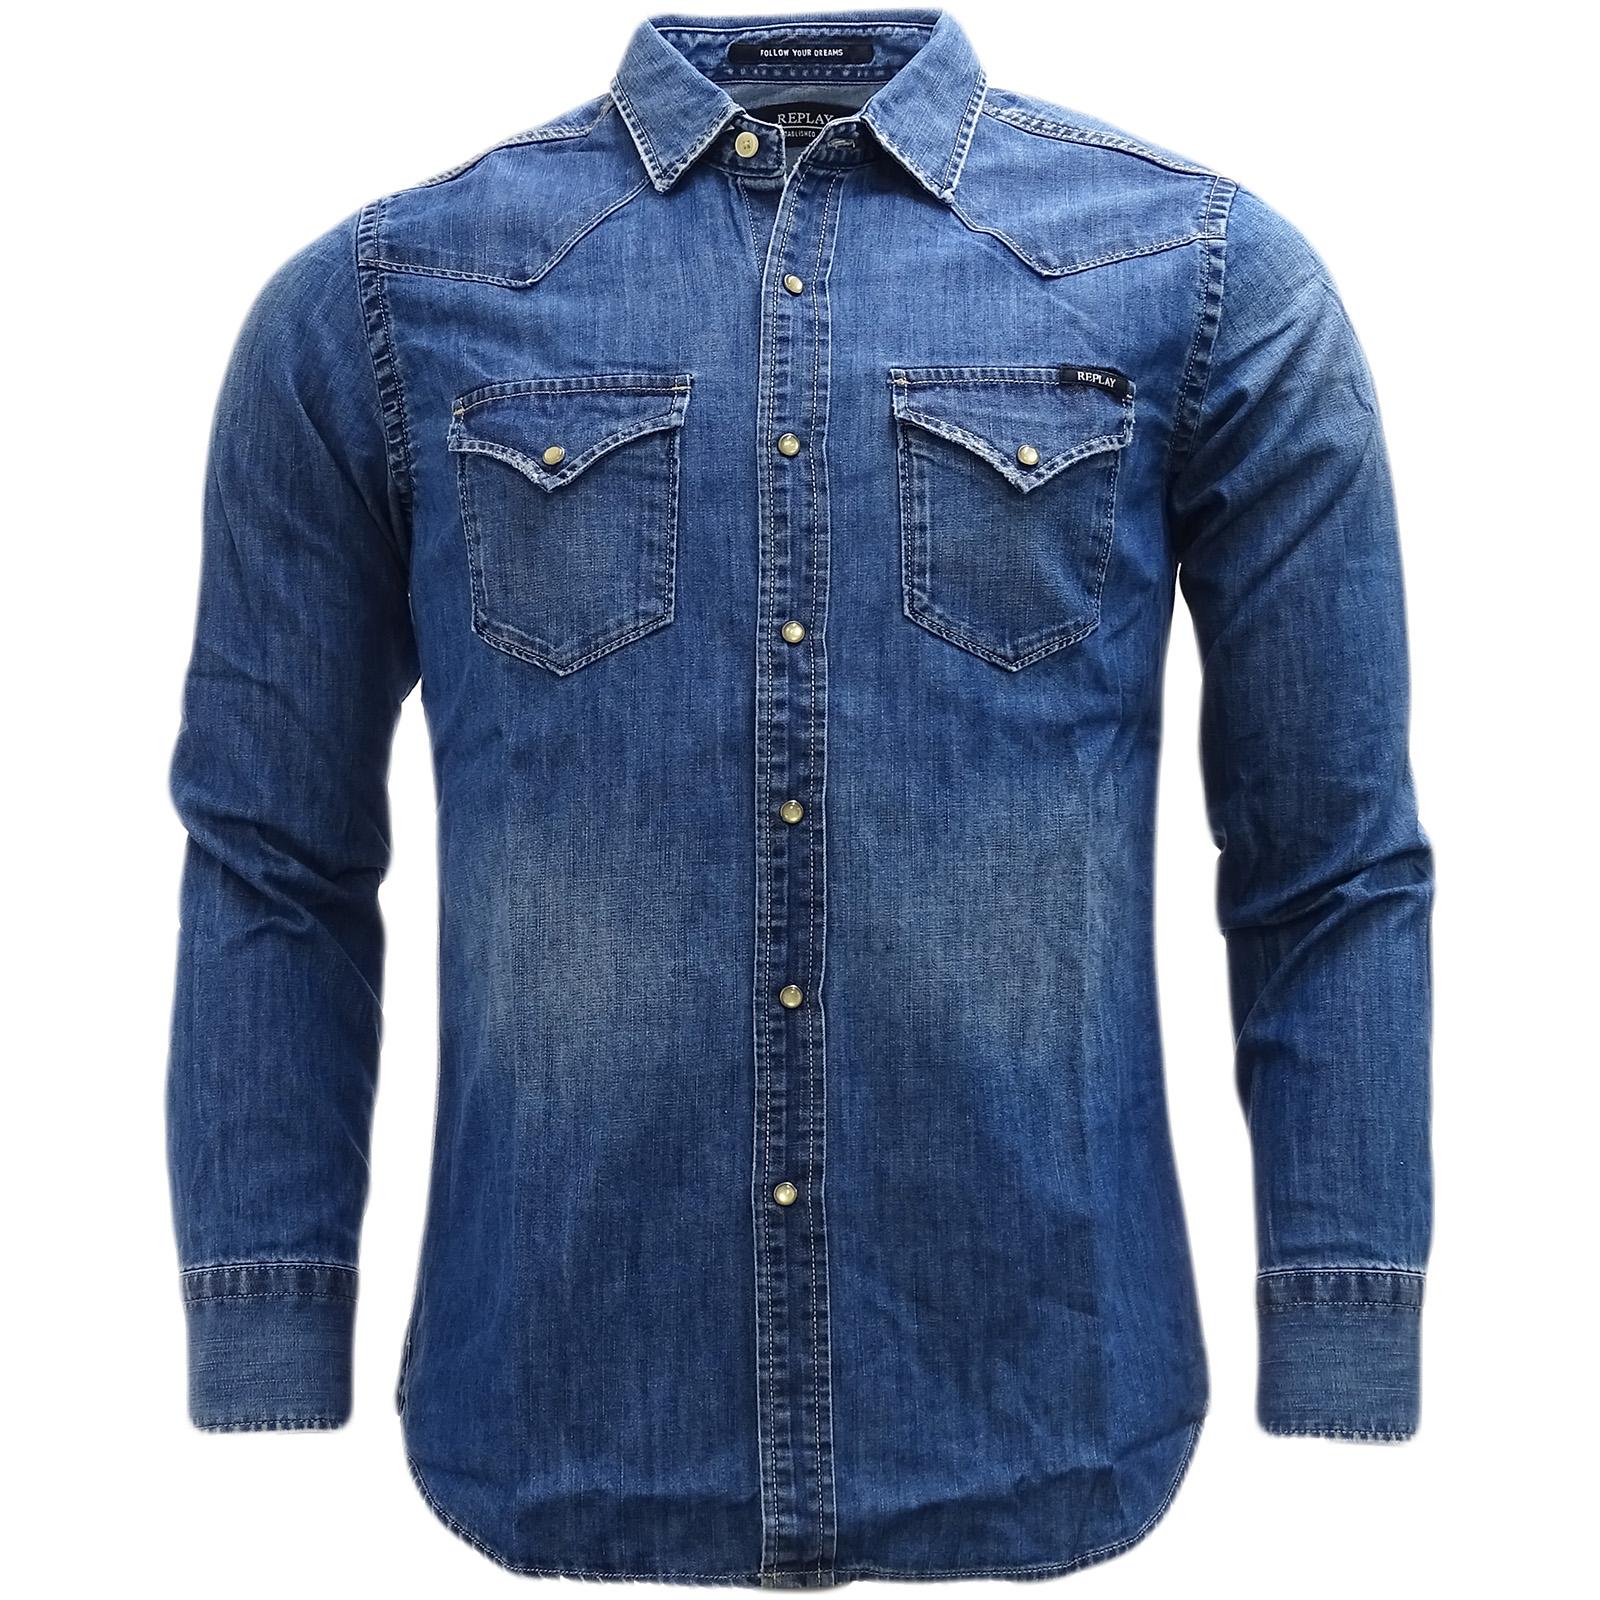 e1cfecc99 Sentinel Replay Blue Western Style Denim Shirt - M4860-009